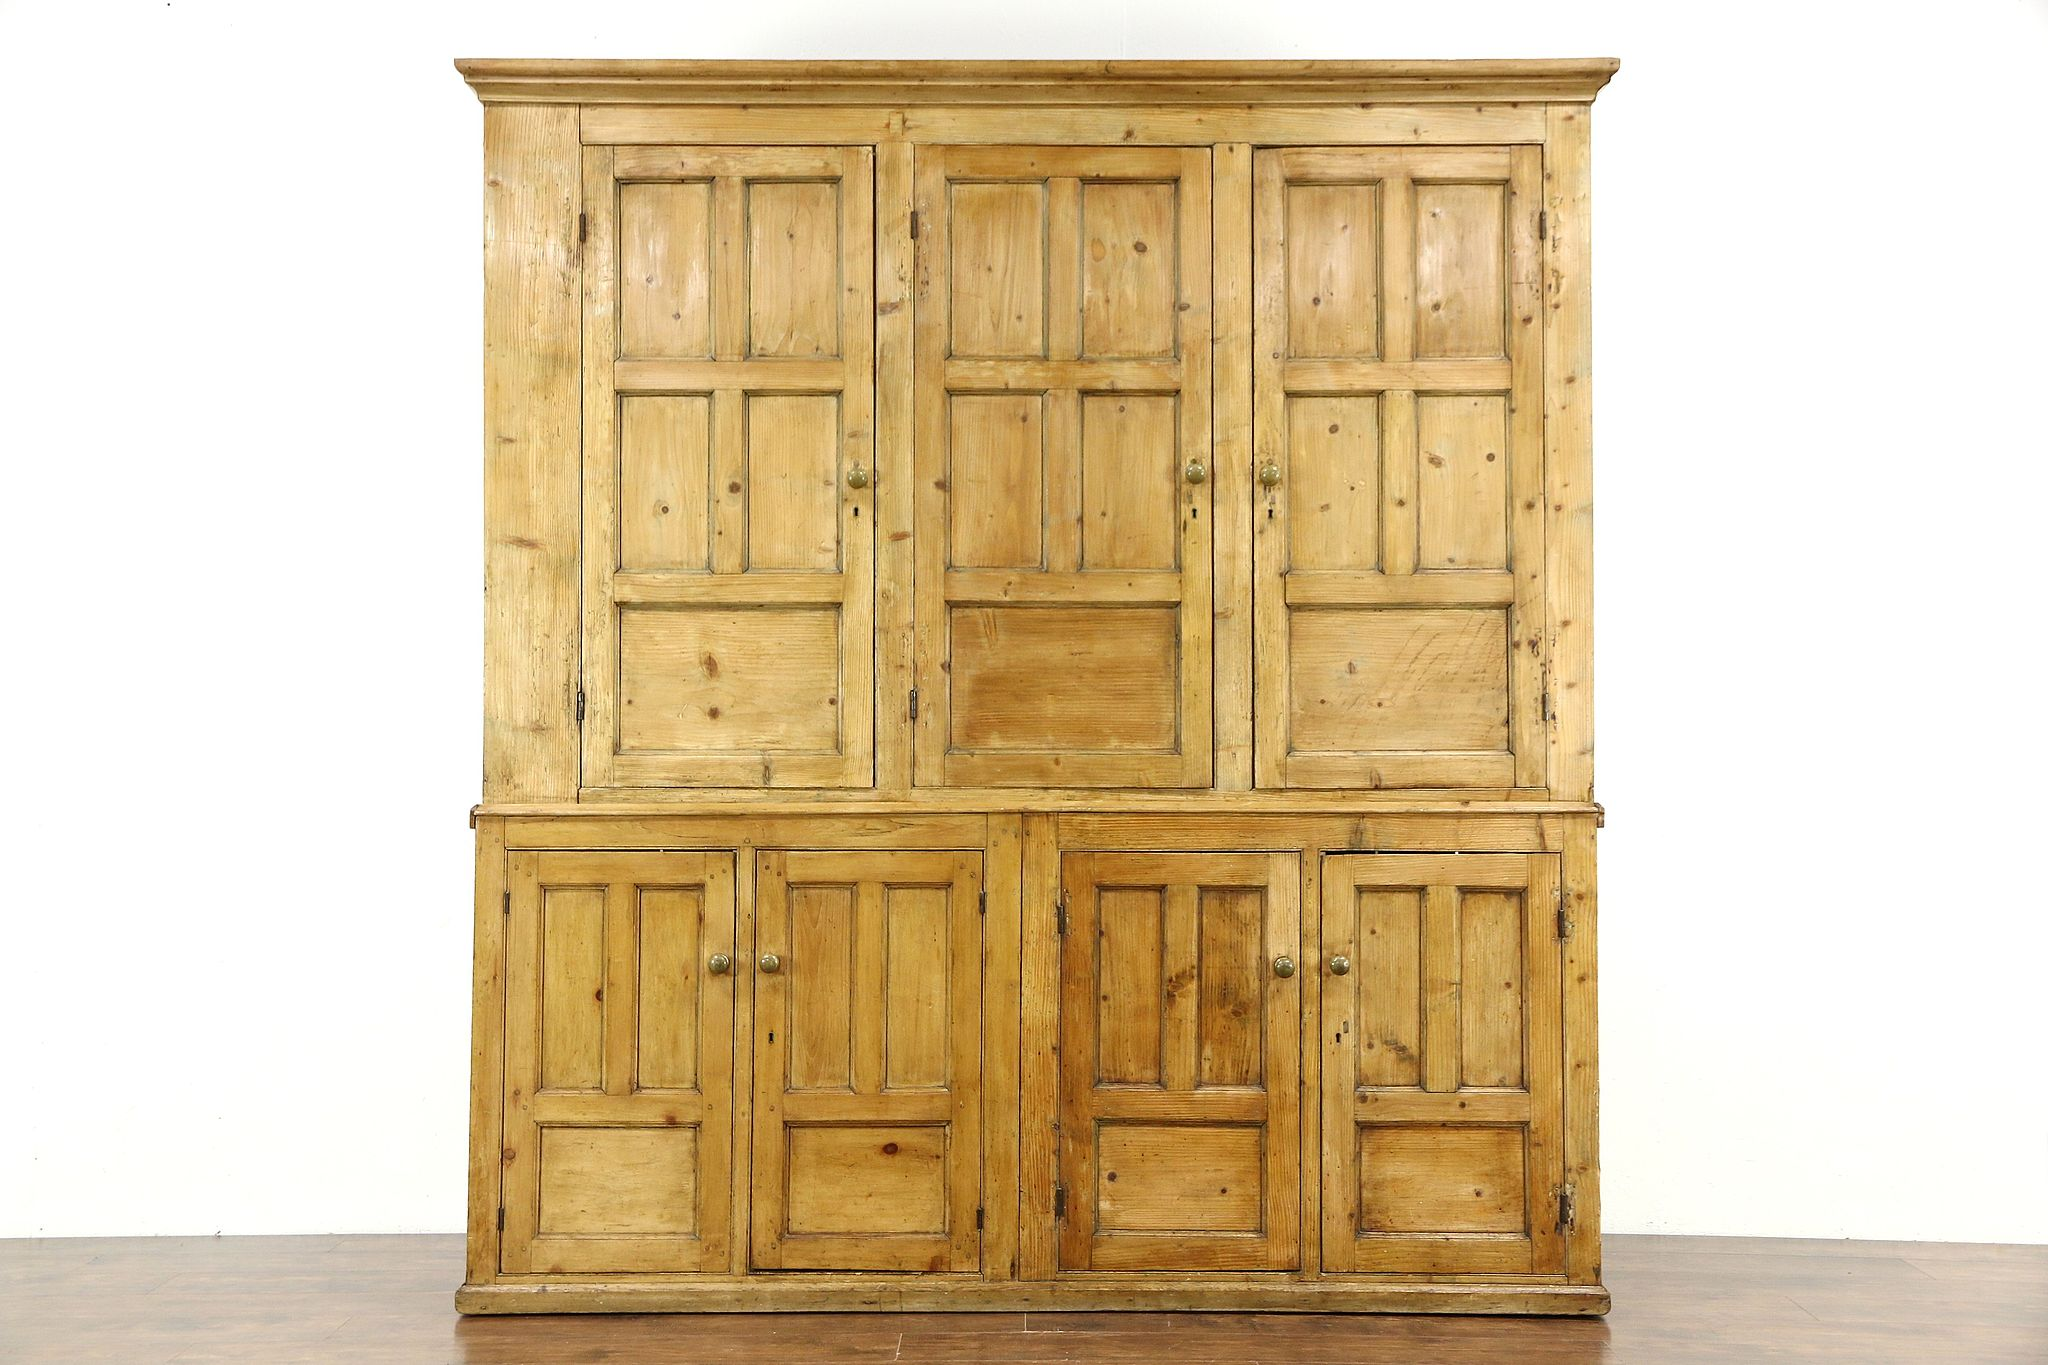 Irish Pine Antique 1850's Country Pine Primitive Cabinet 89